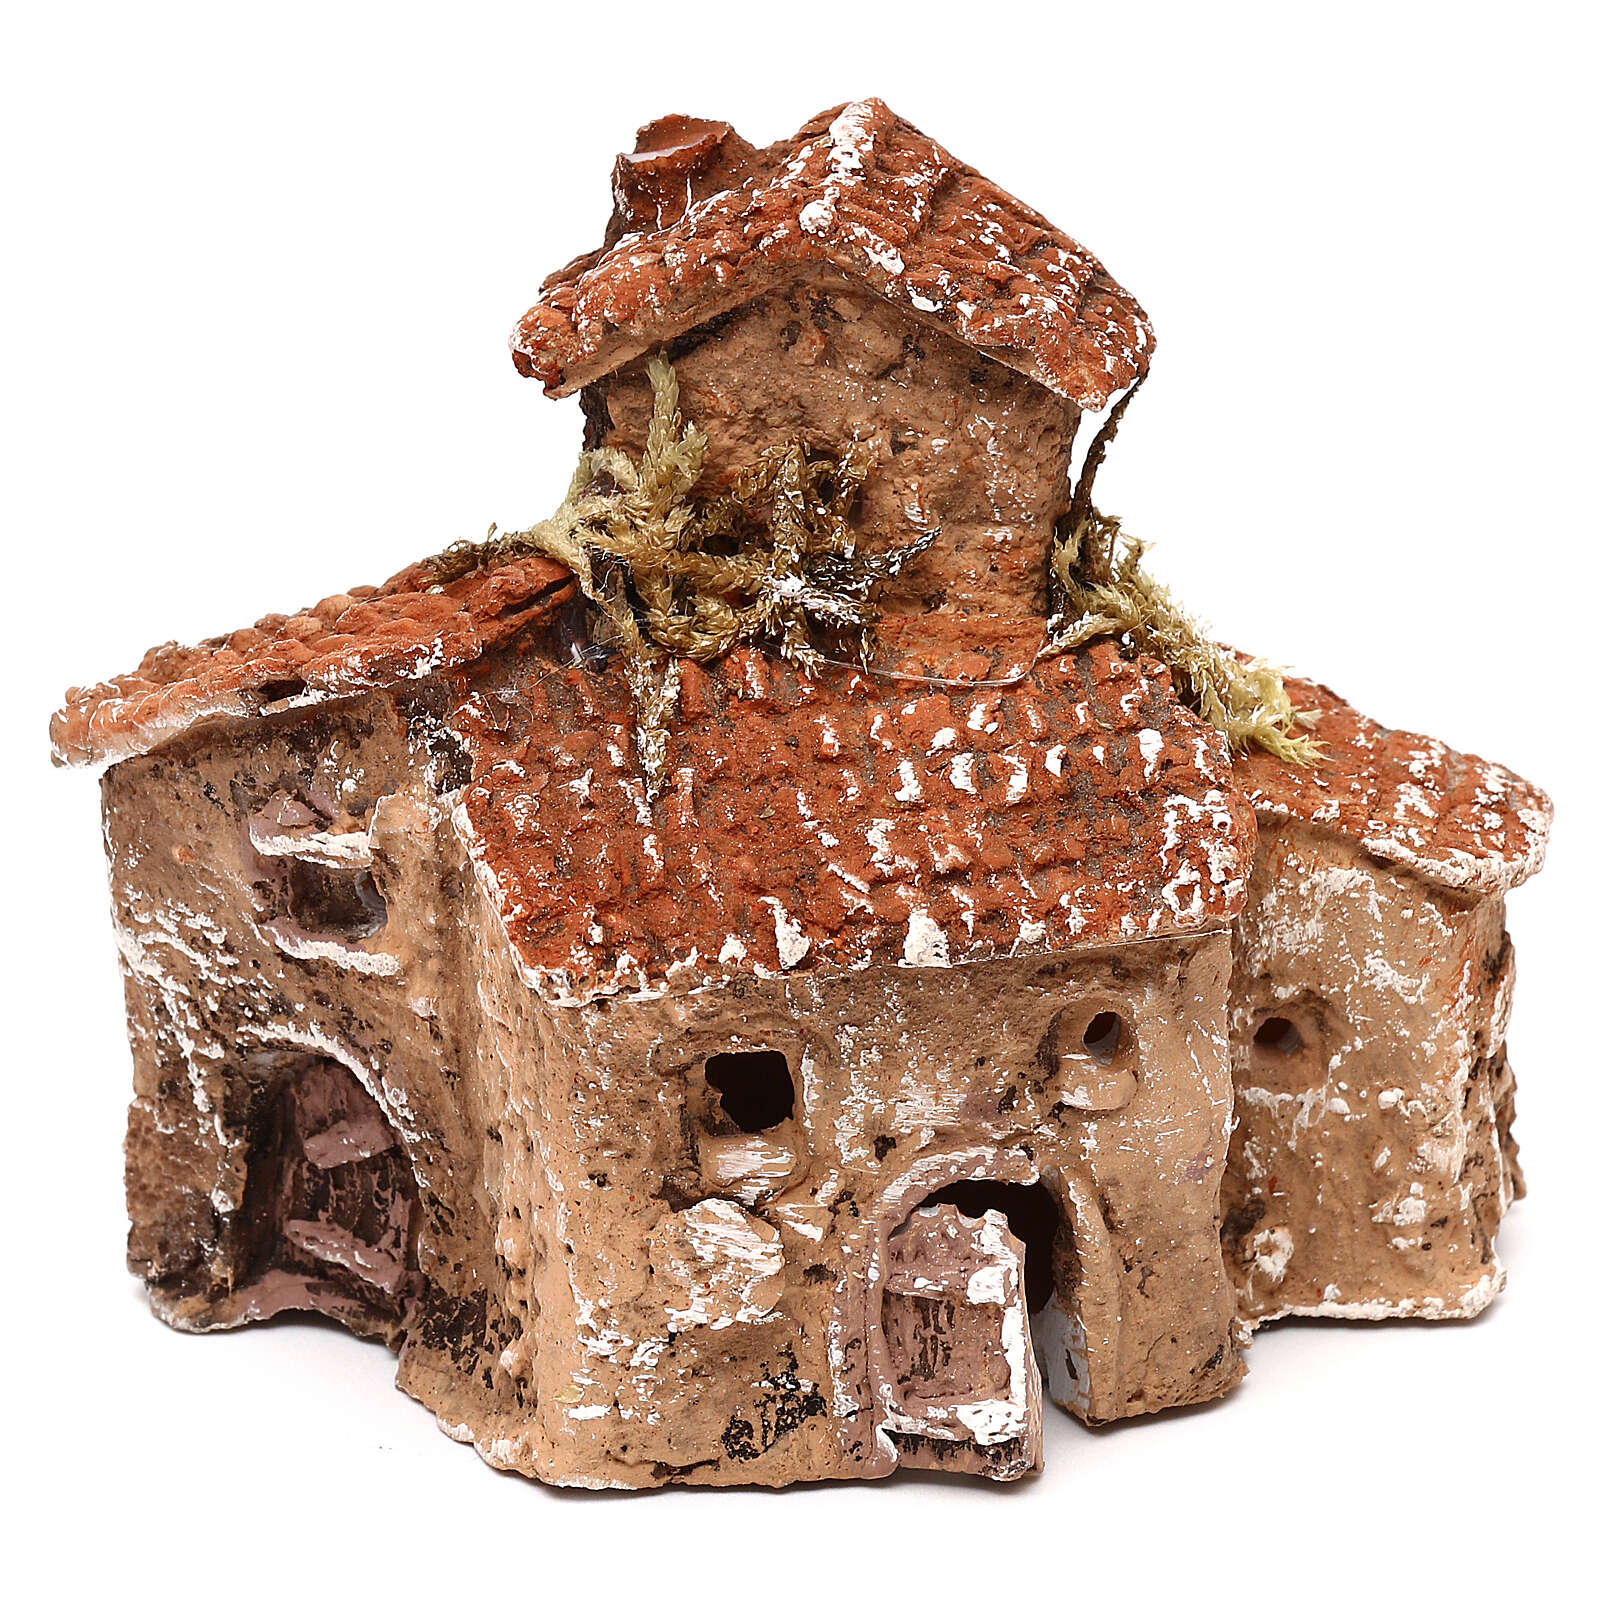 Miniature village 10x10x5 cm for 3-4 cm Neapolitan nativity 4